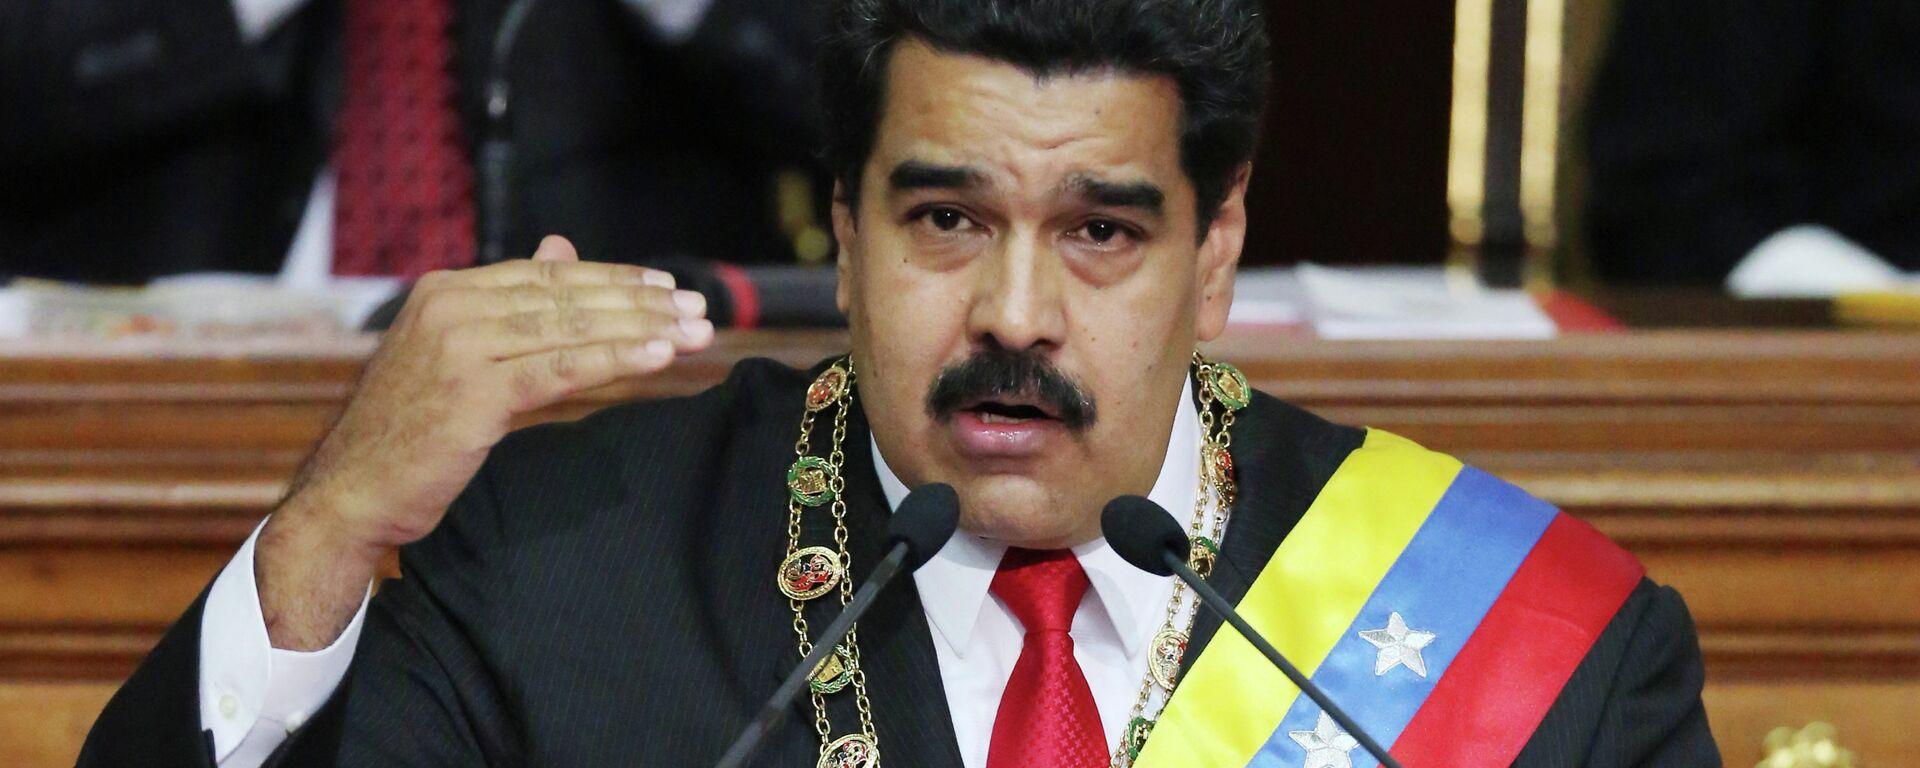 Venezuela's President Nicolas Maduro, speaks during the annual state-of-the-nation address at the National Assembly in Caracas, Venezuela, Wednesday, Jan 21, 2015 - Sputnik Mundo, 1920, 28.06.2021